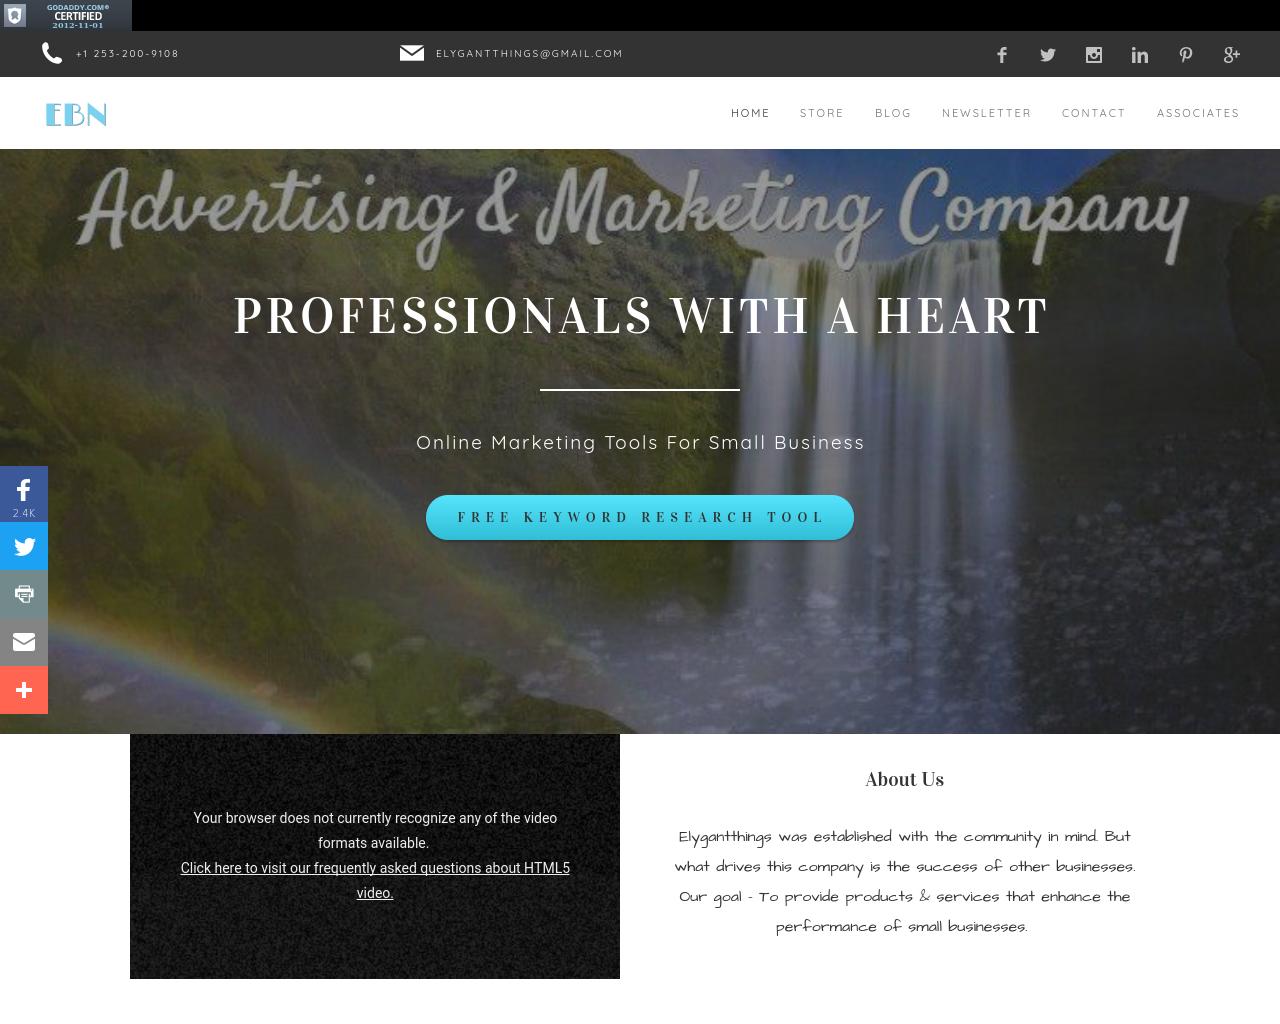 Elygantthings-Advertising-Reviews-Pricing